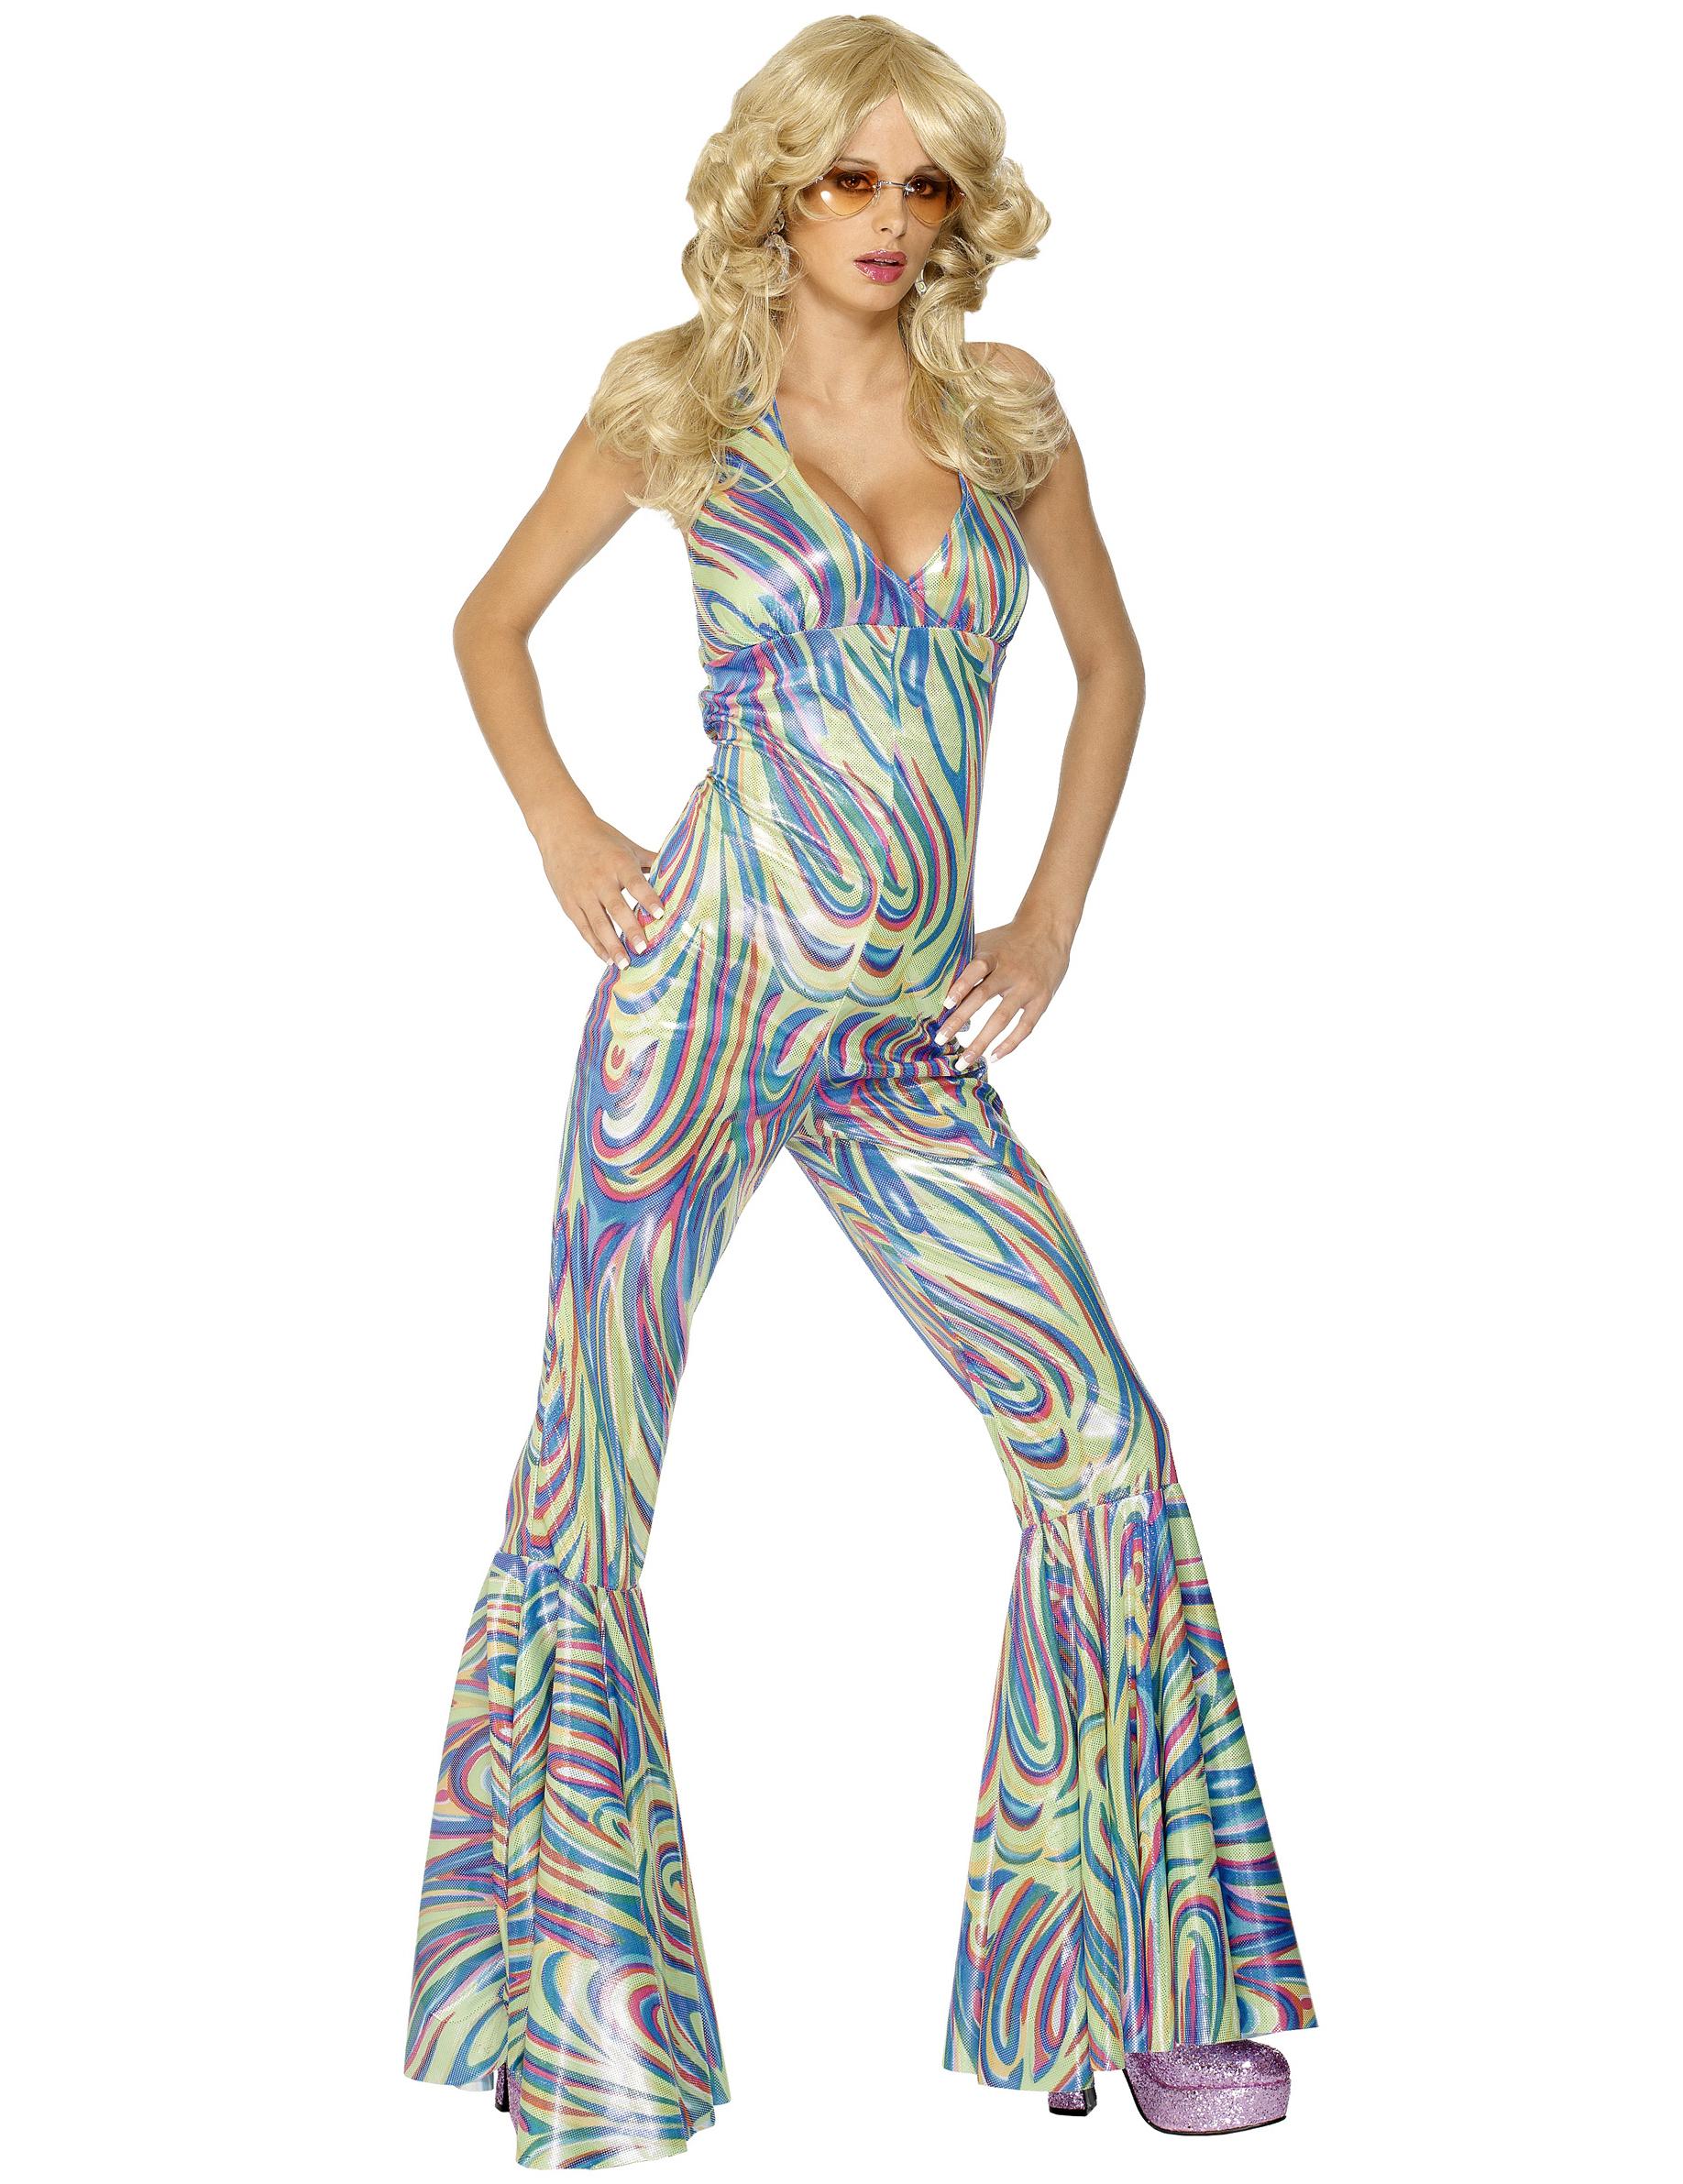 Disco fashion for women pictures 70s Disco Fashion, Mini Dress, Maxi, Platform Soled Shoes